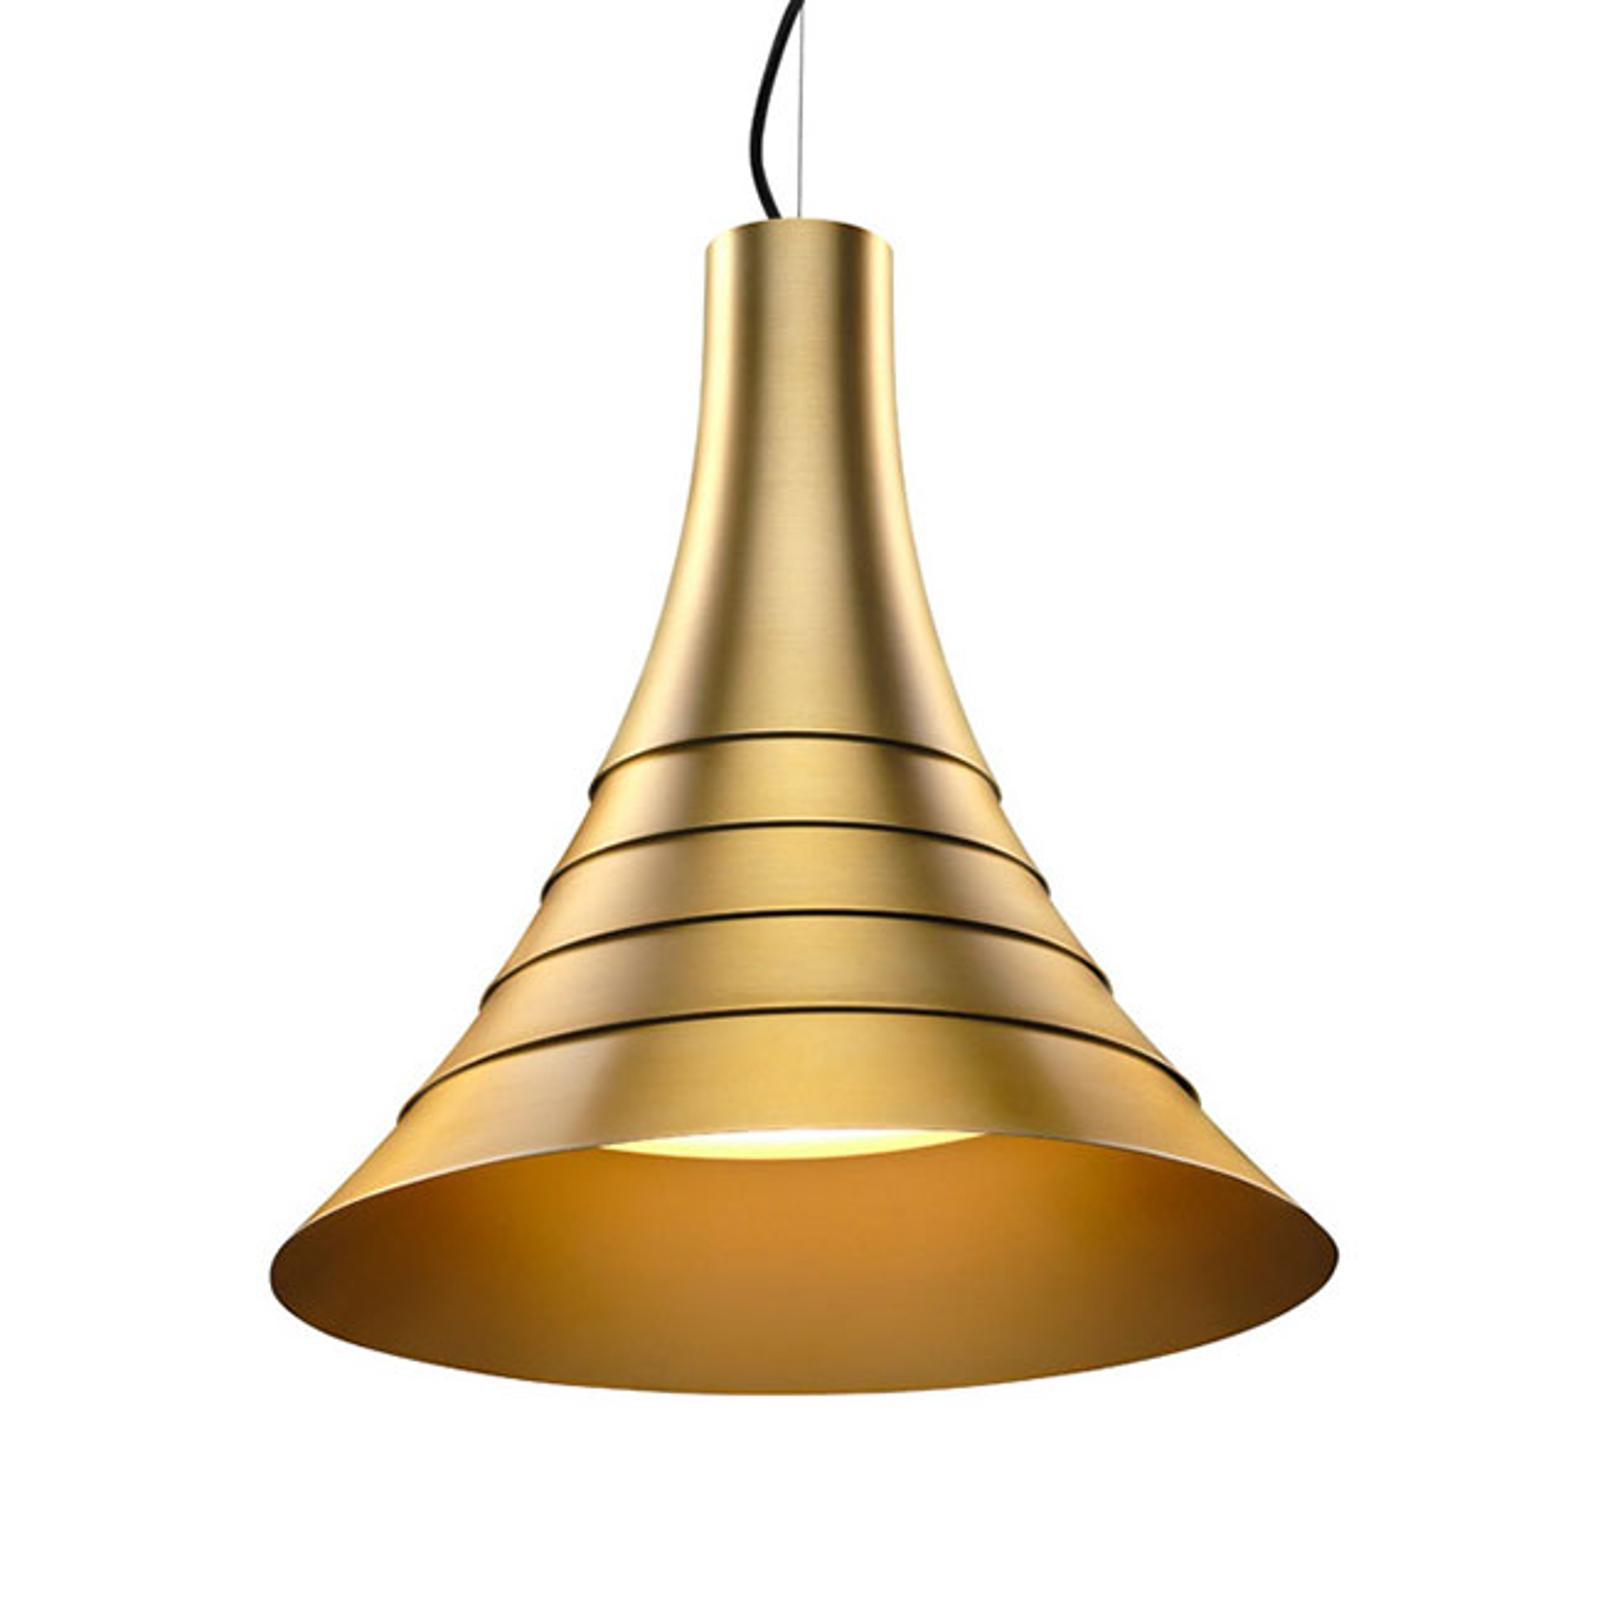 SLV Bato 45 lampa wisząca LED mosiądz Ø45cm